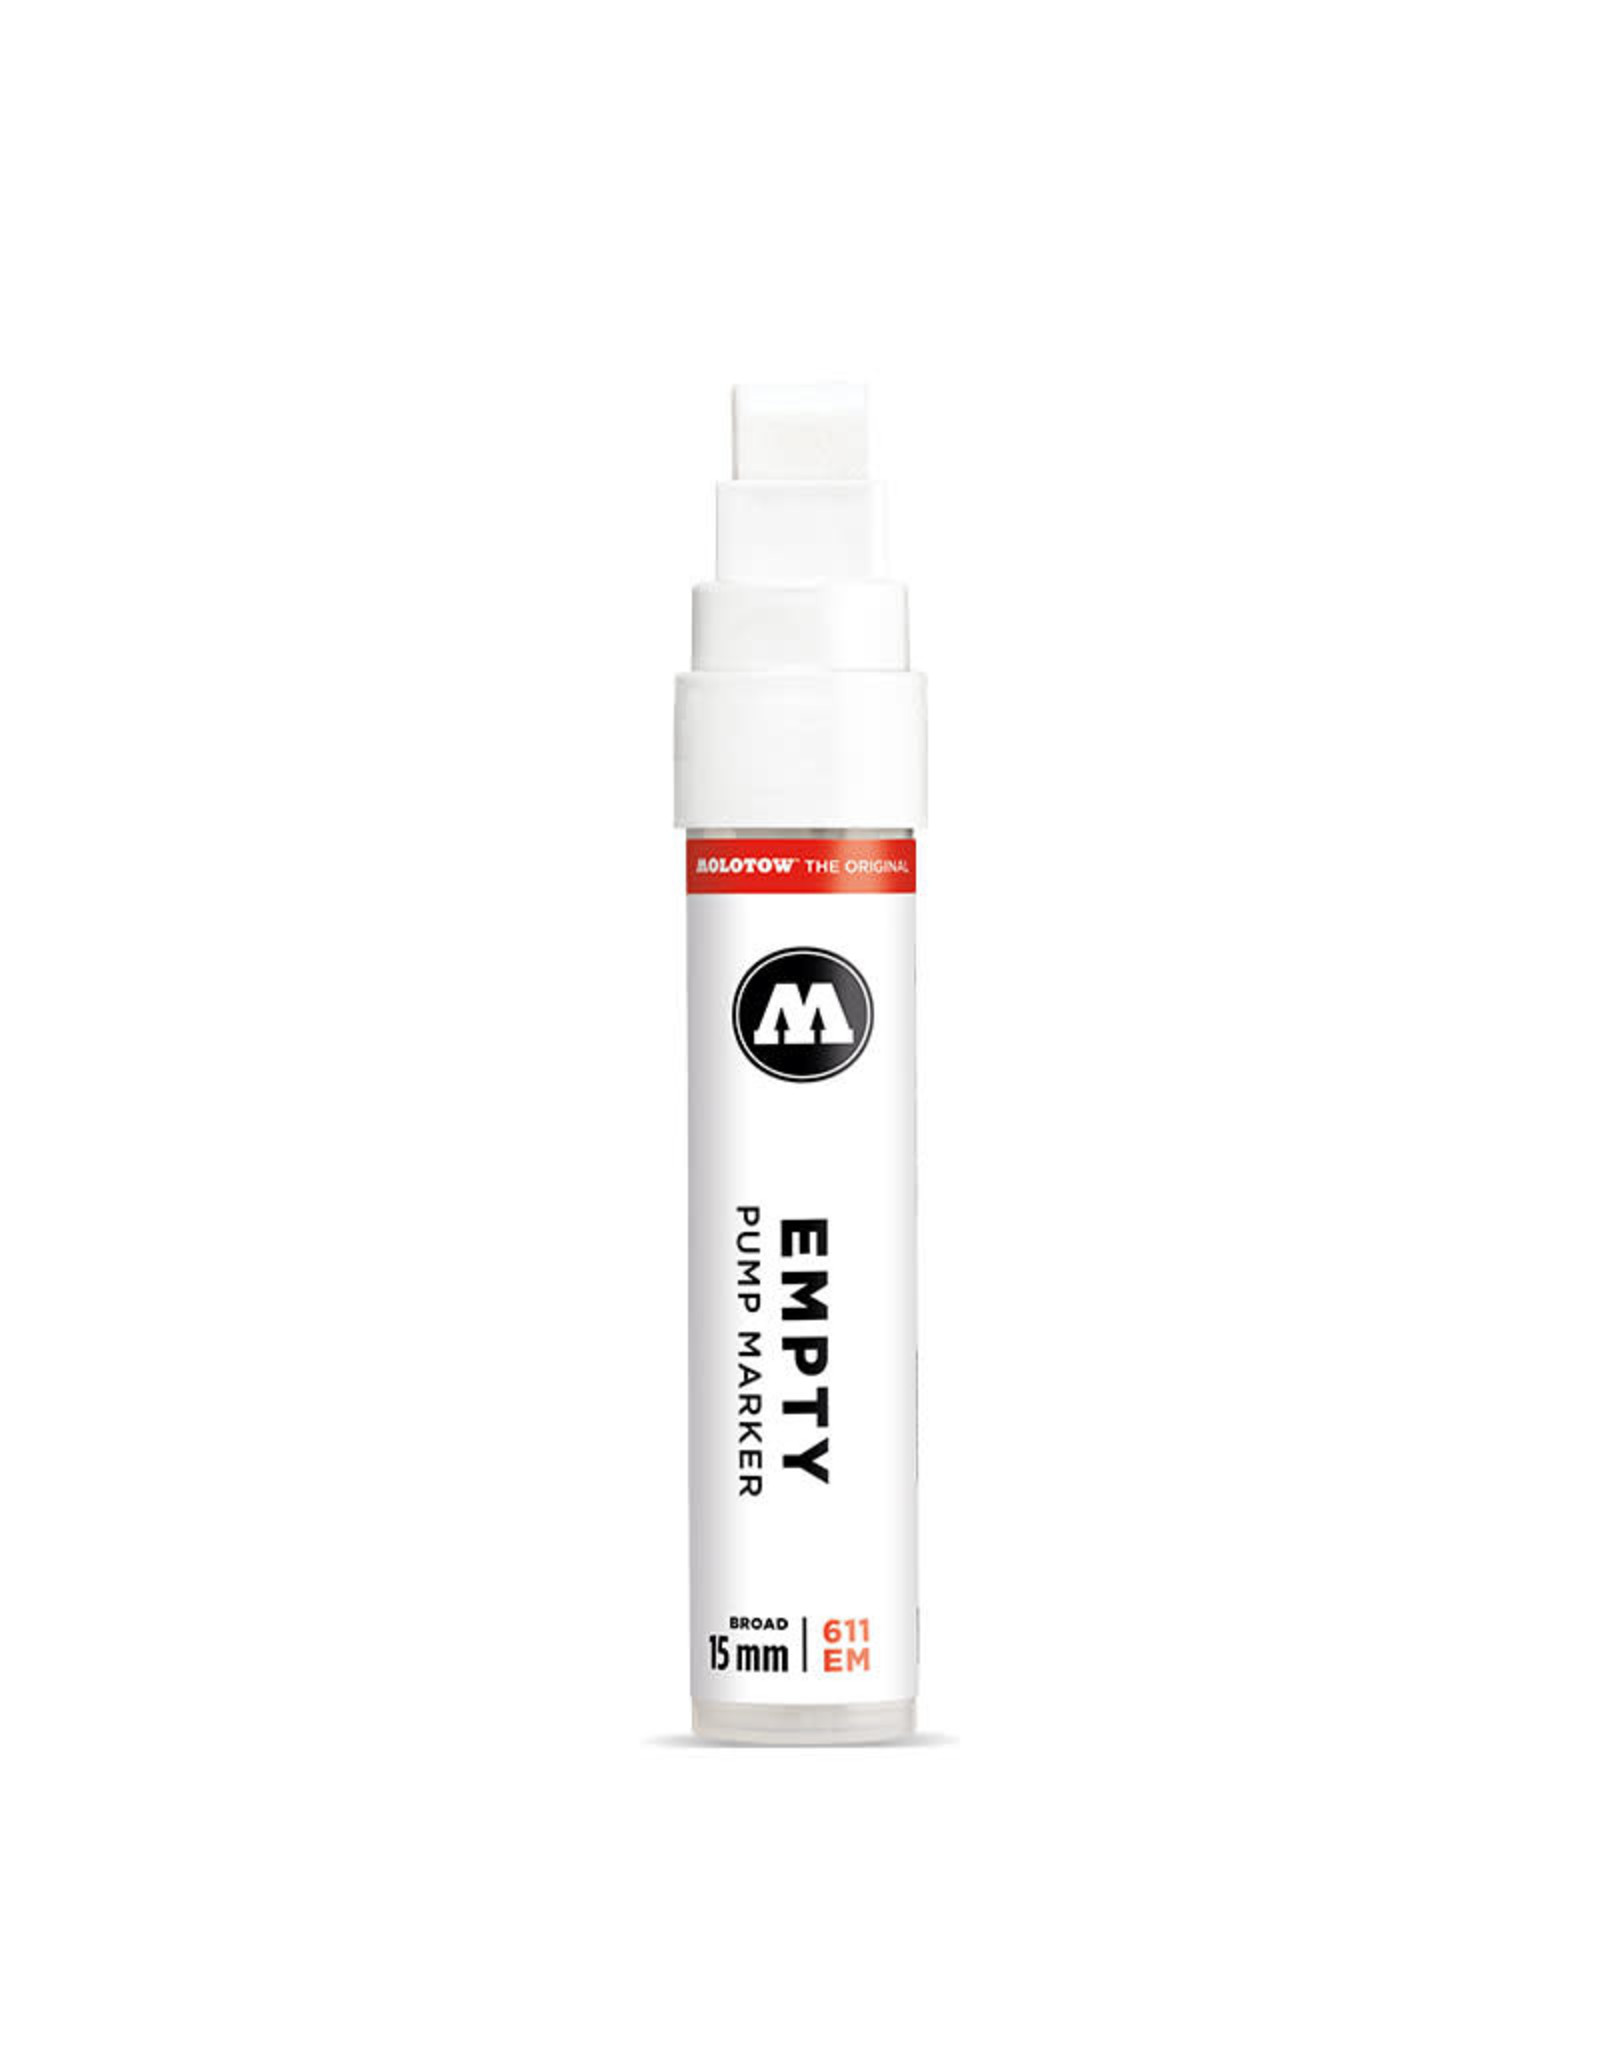 MOLOTOW MOLOTOW Empty Marker 611EM 15 mm